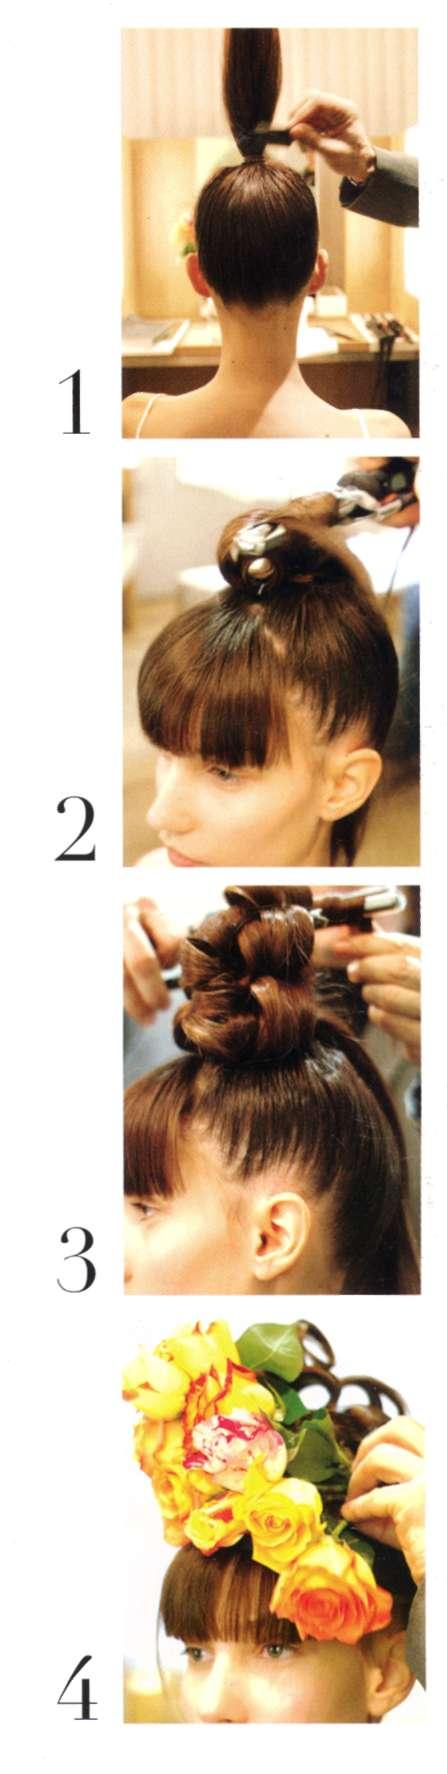 http://klow.ru/images/1f40384735413a382-46.jpg